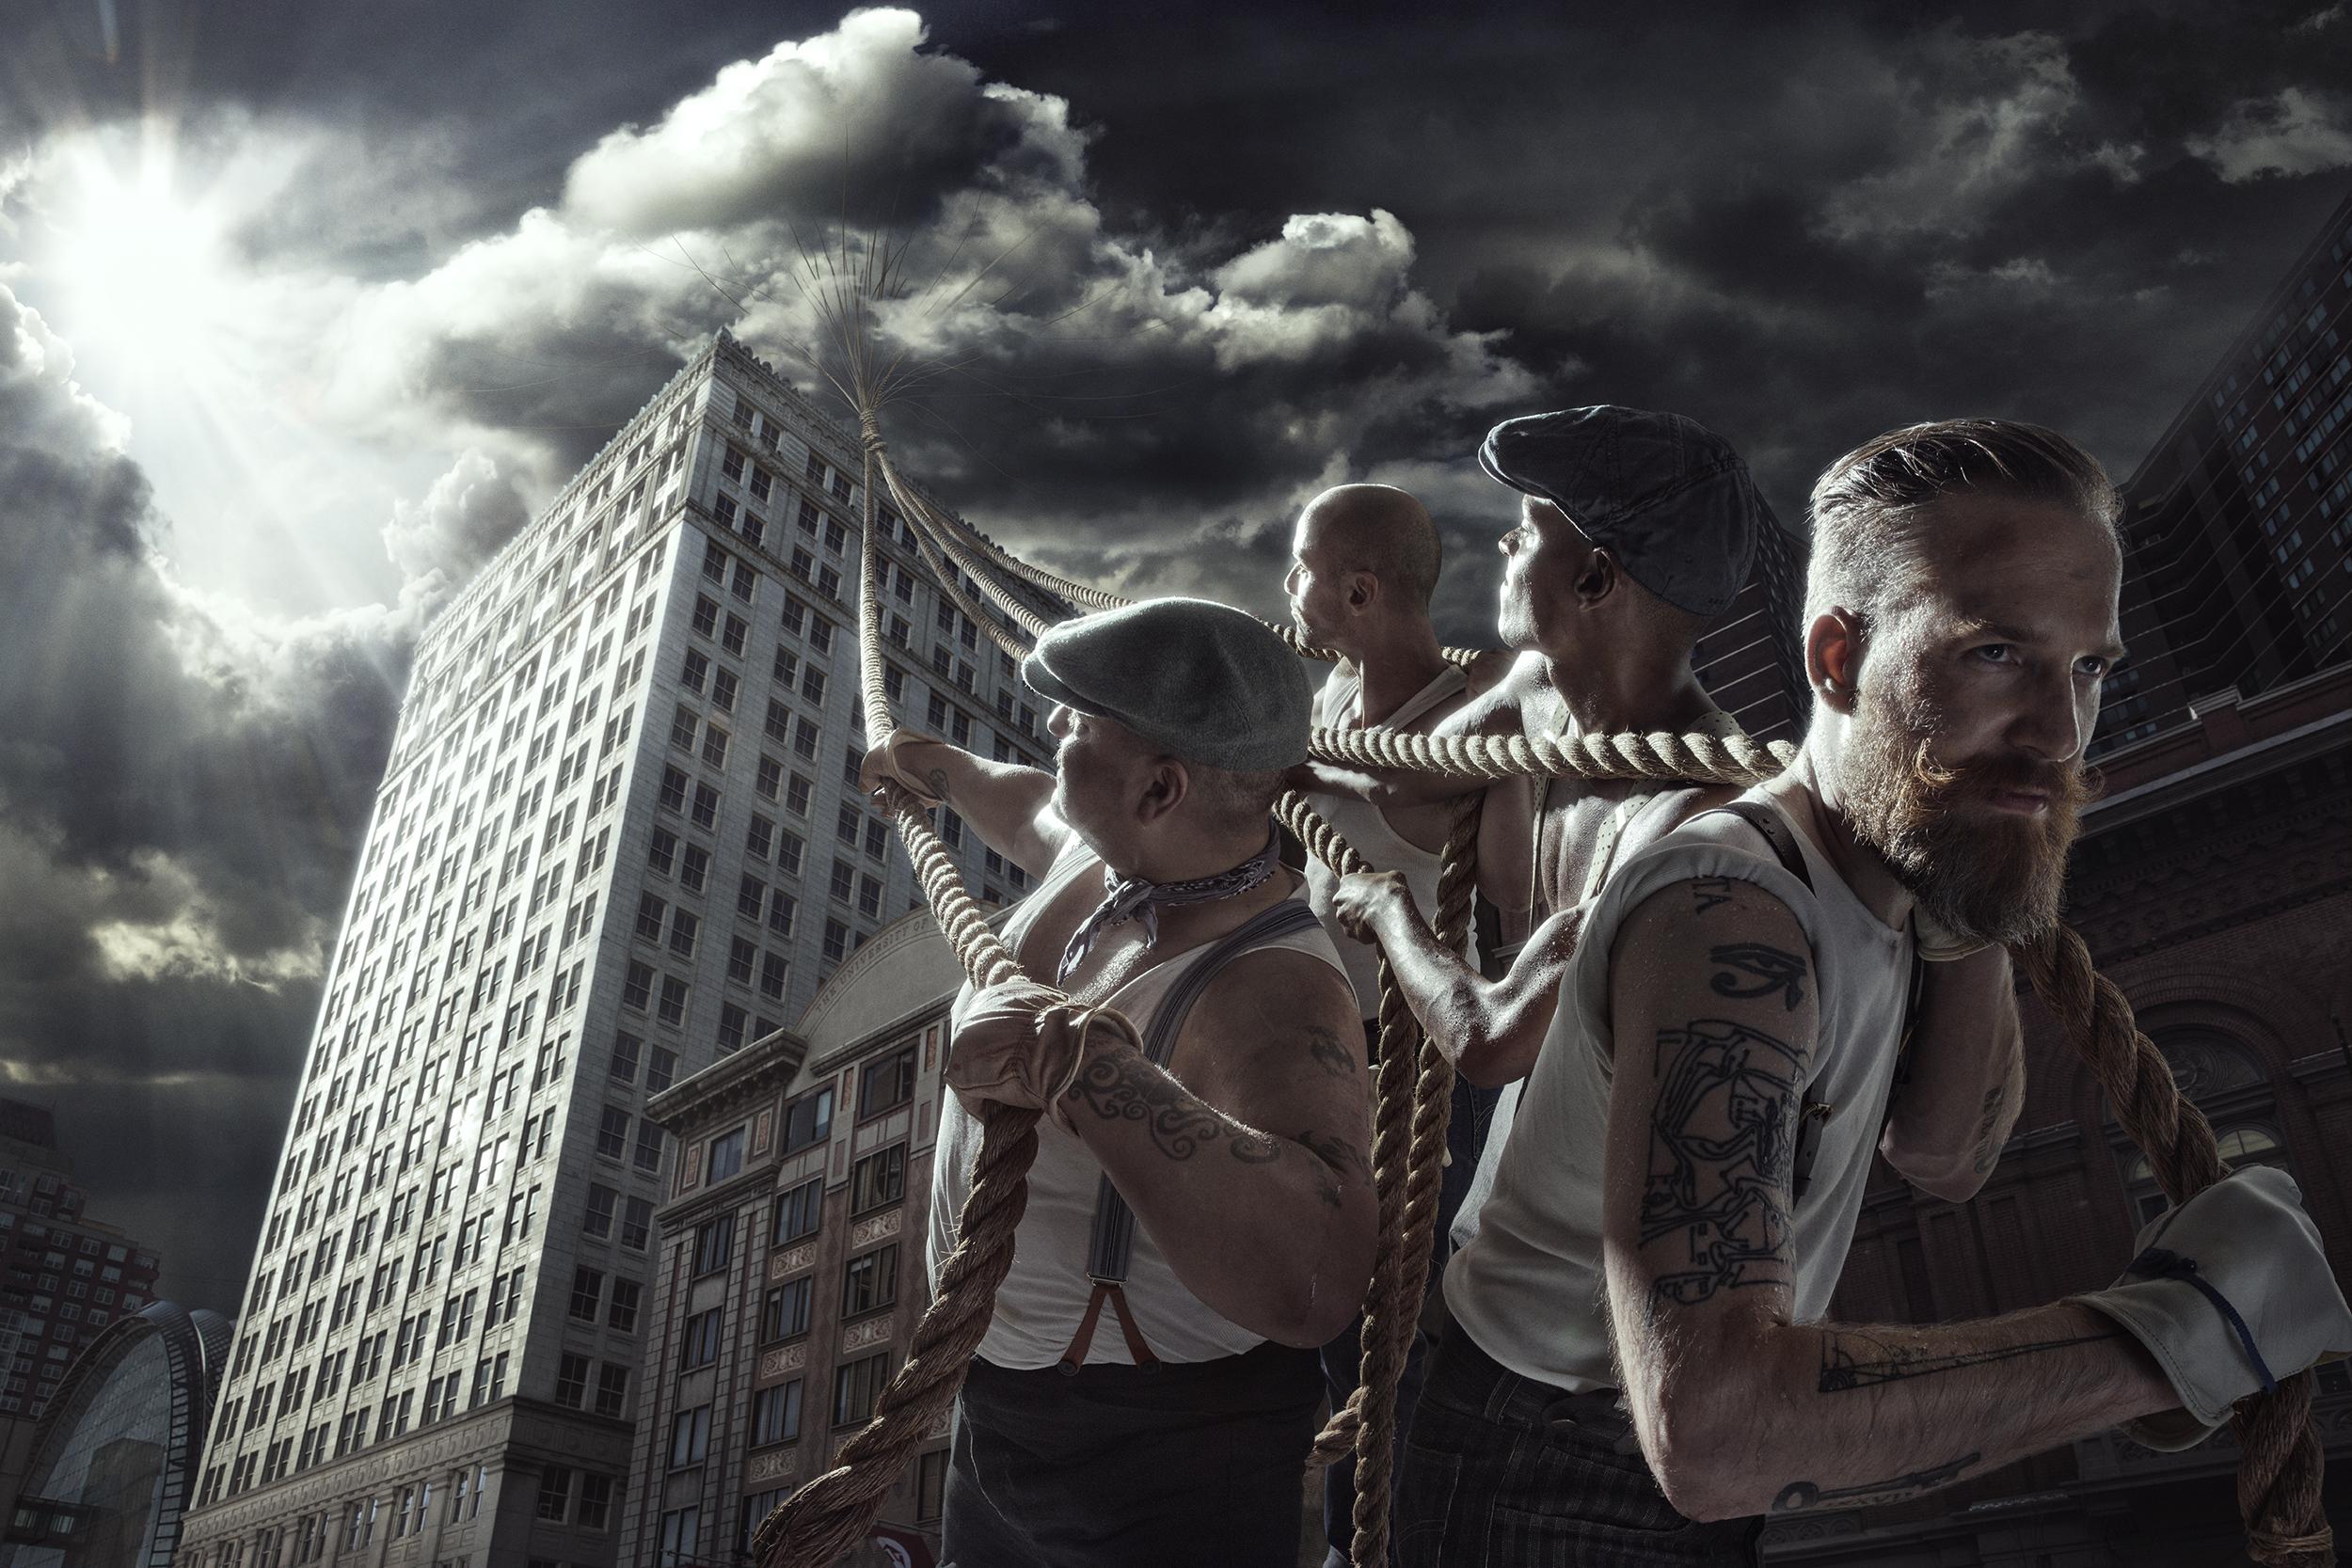 Photographer: Tony Notarberardino  ReToucher: Jim Lind  The Atlantic Project - Creative Soldier LLC